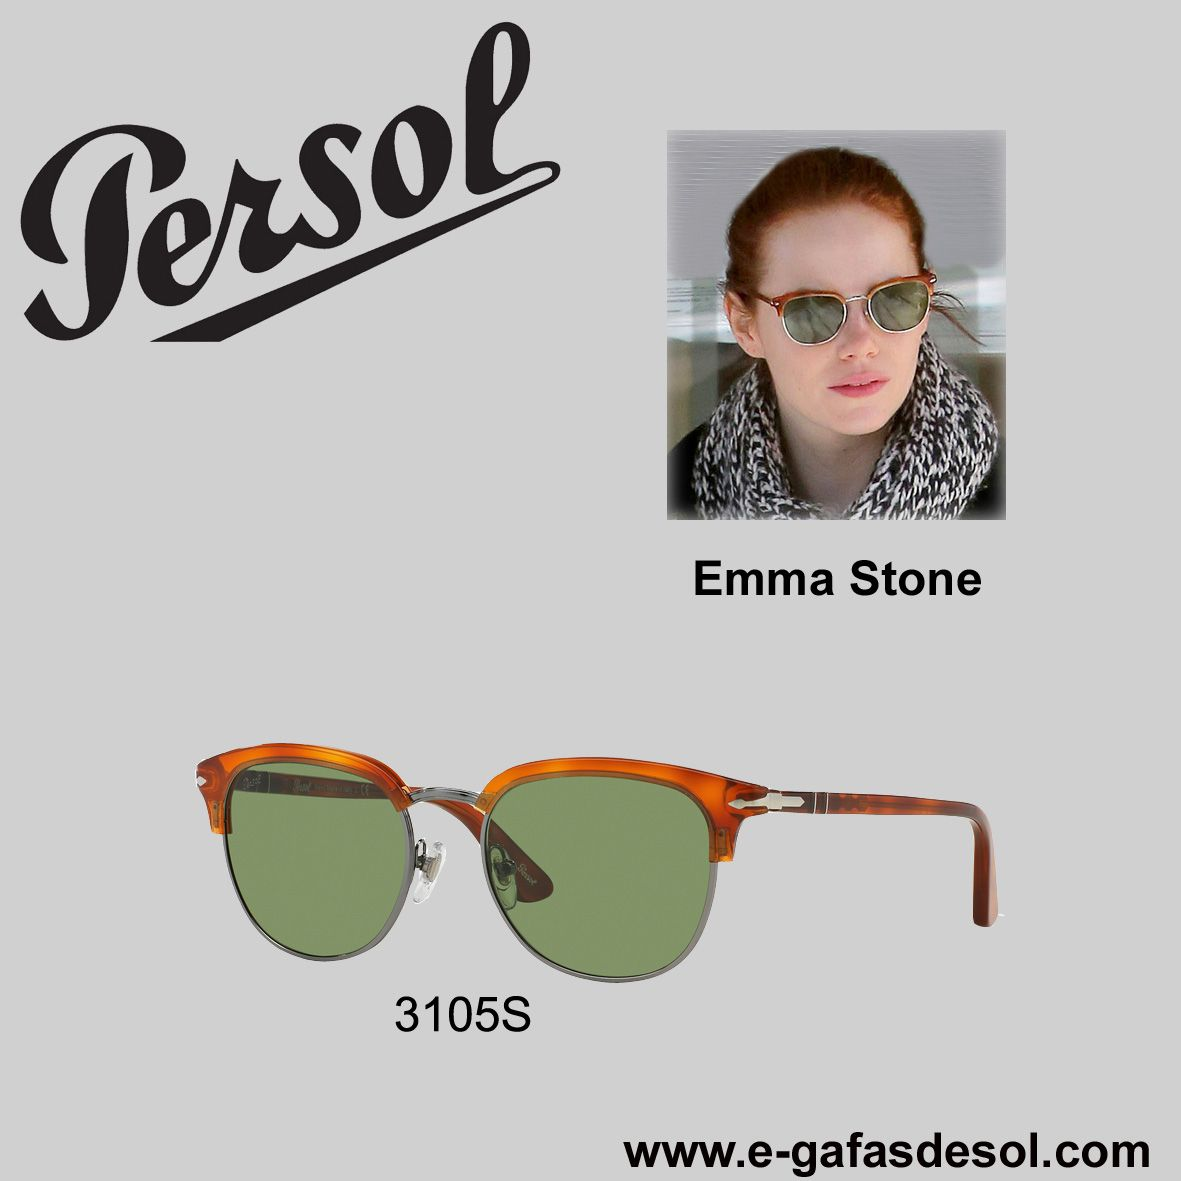 de043e09c1 La actriz Emma Stone con unas gafas PERSOL 3105S. The actress Emma Stone  wearing a PERSOL 3105S sunglasses.